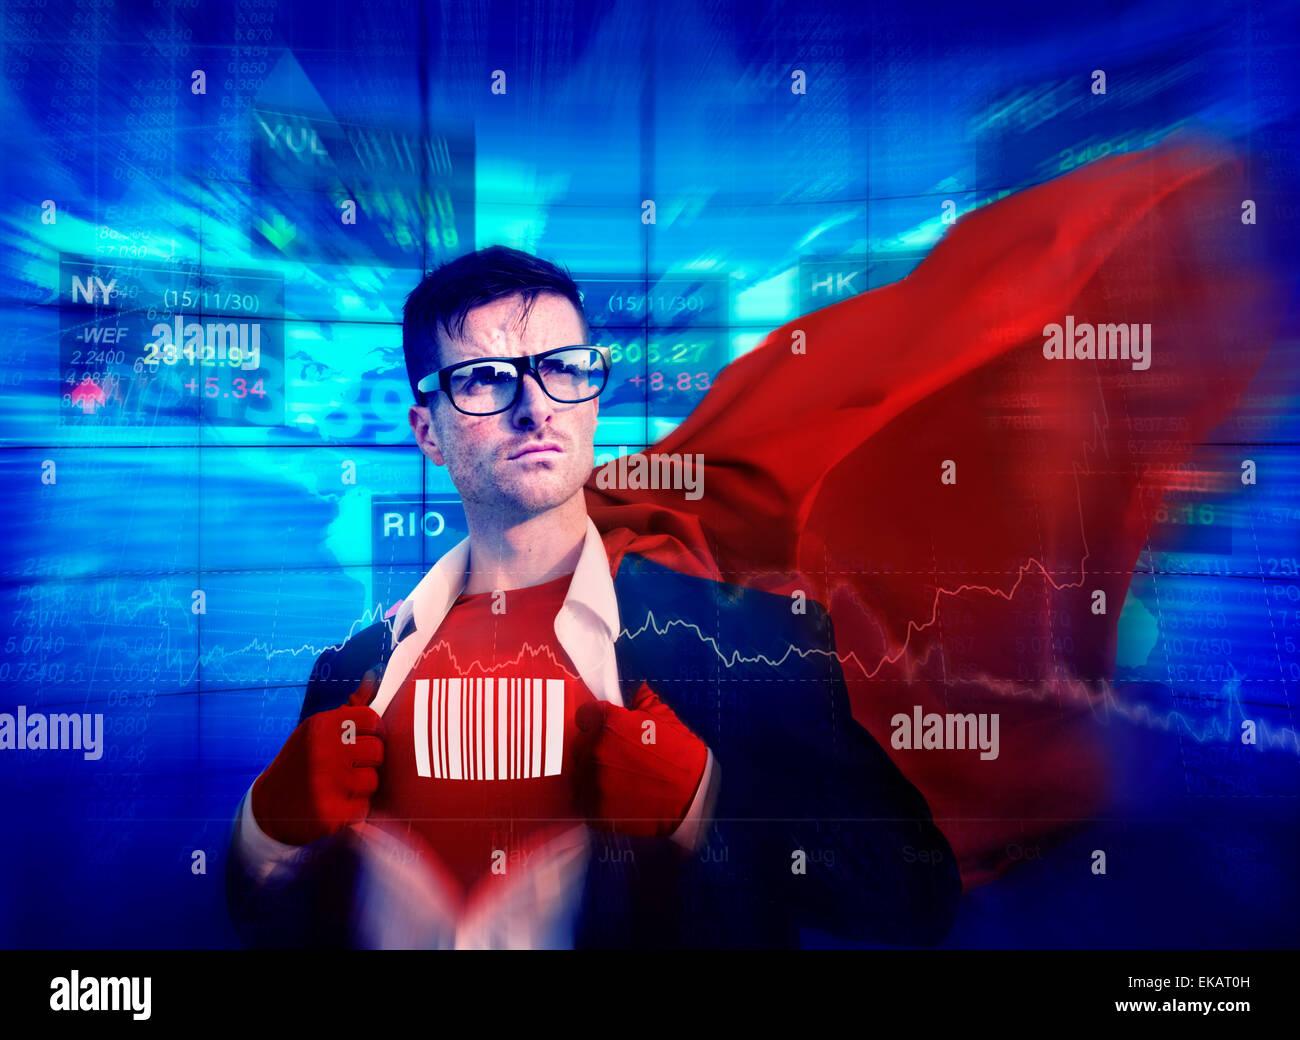 Barcode Strong Superhero Success Professional Empowerment Stock Concept - Stock Image